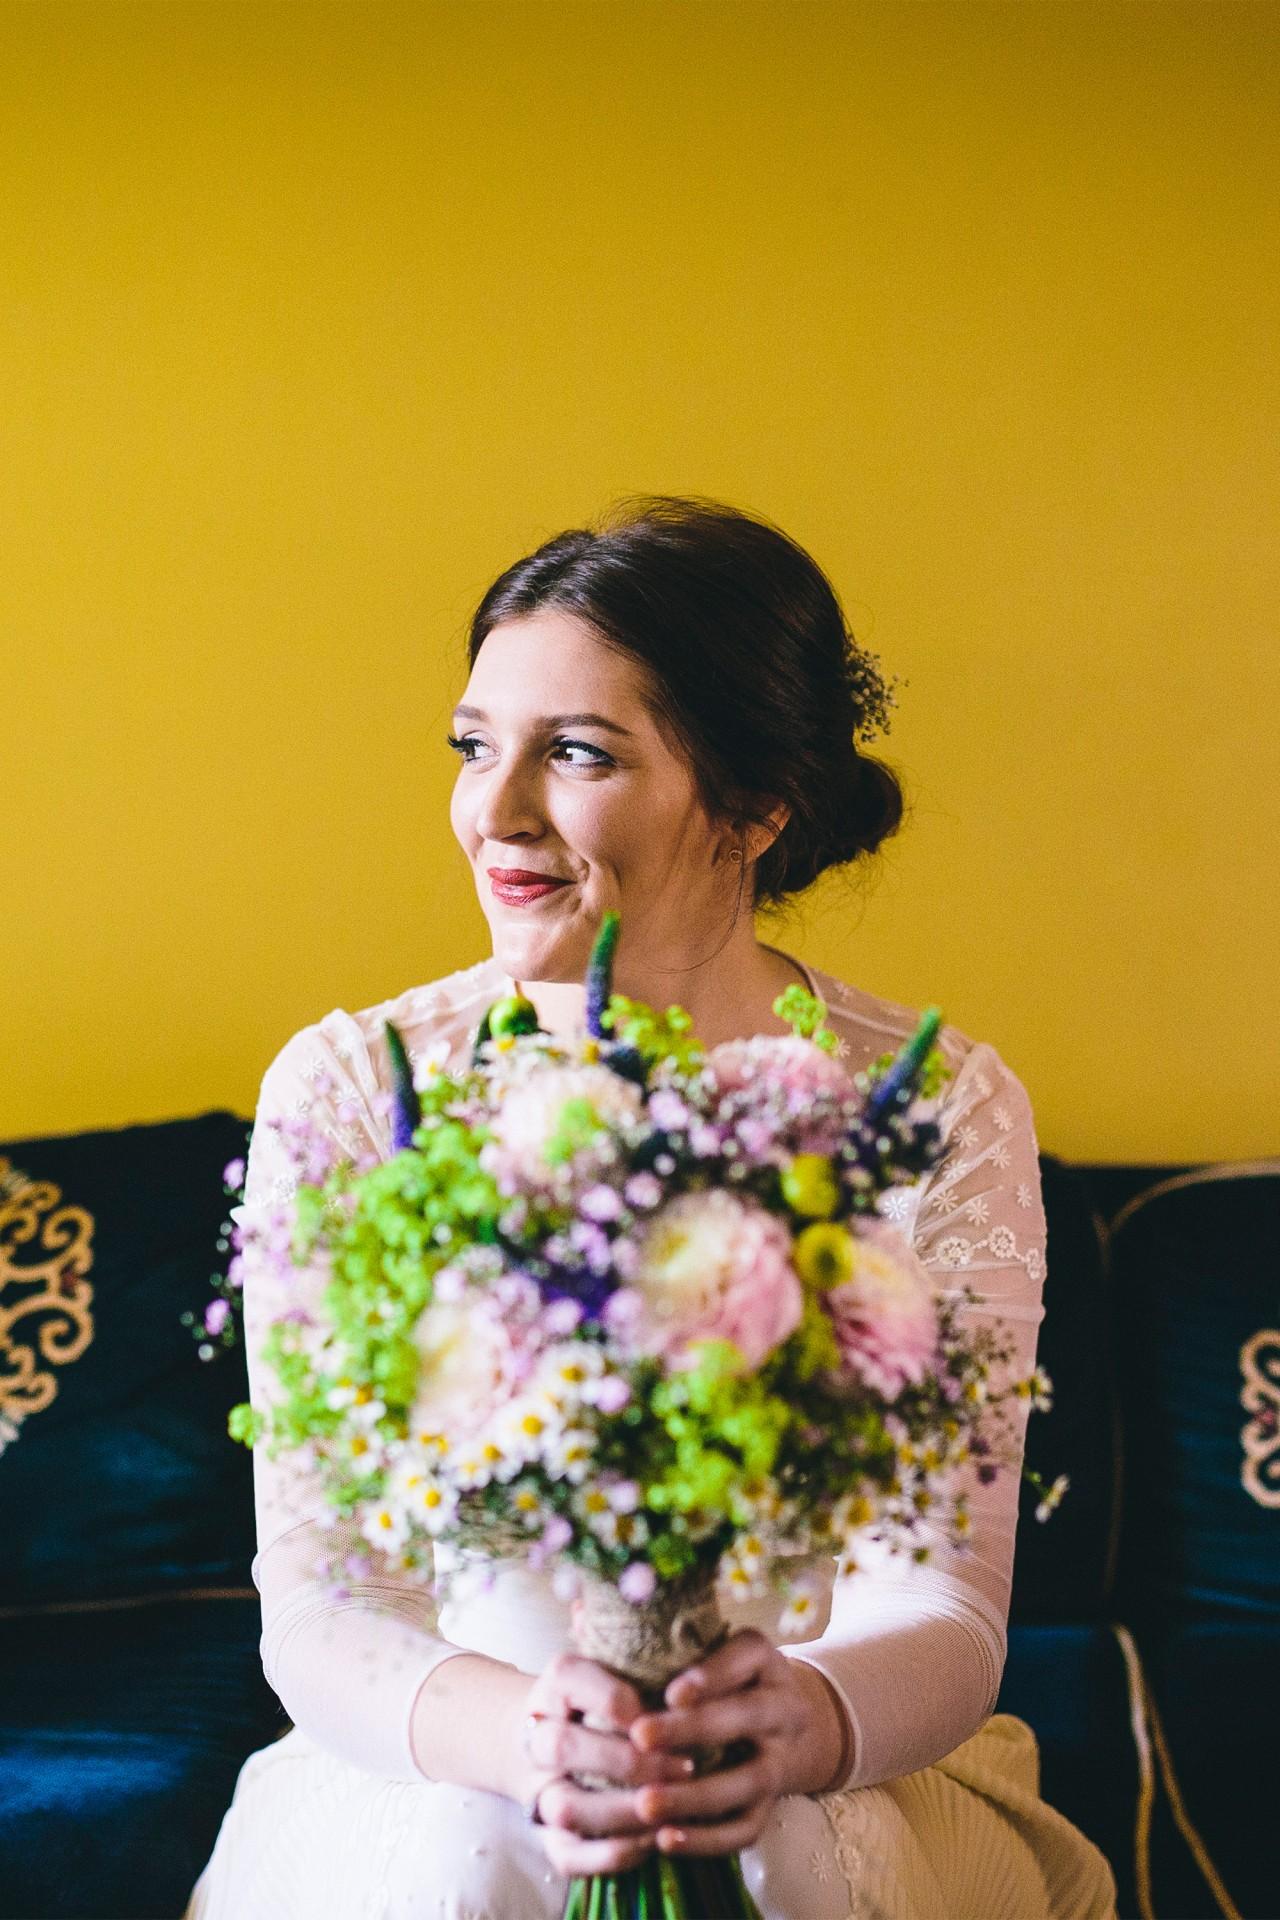 Sophie_Alex_Botanical-Romance-Wedding_SBS_004